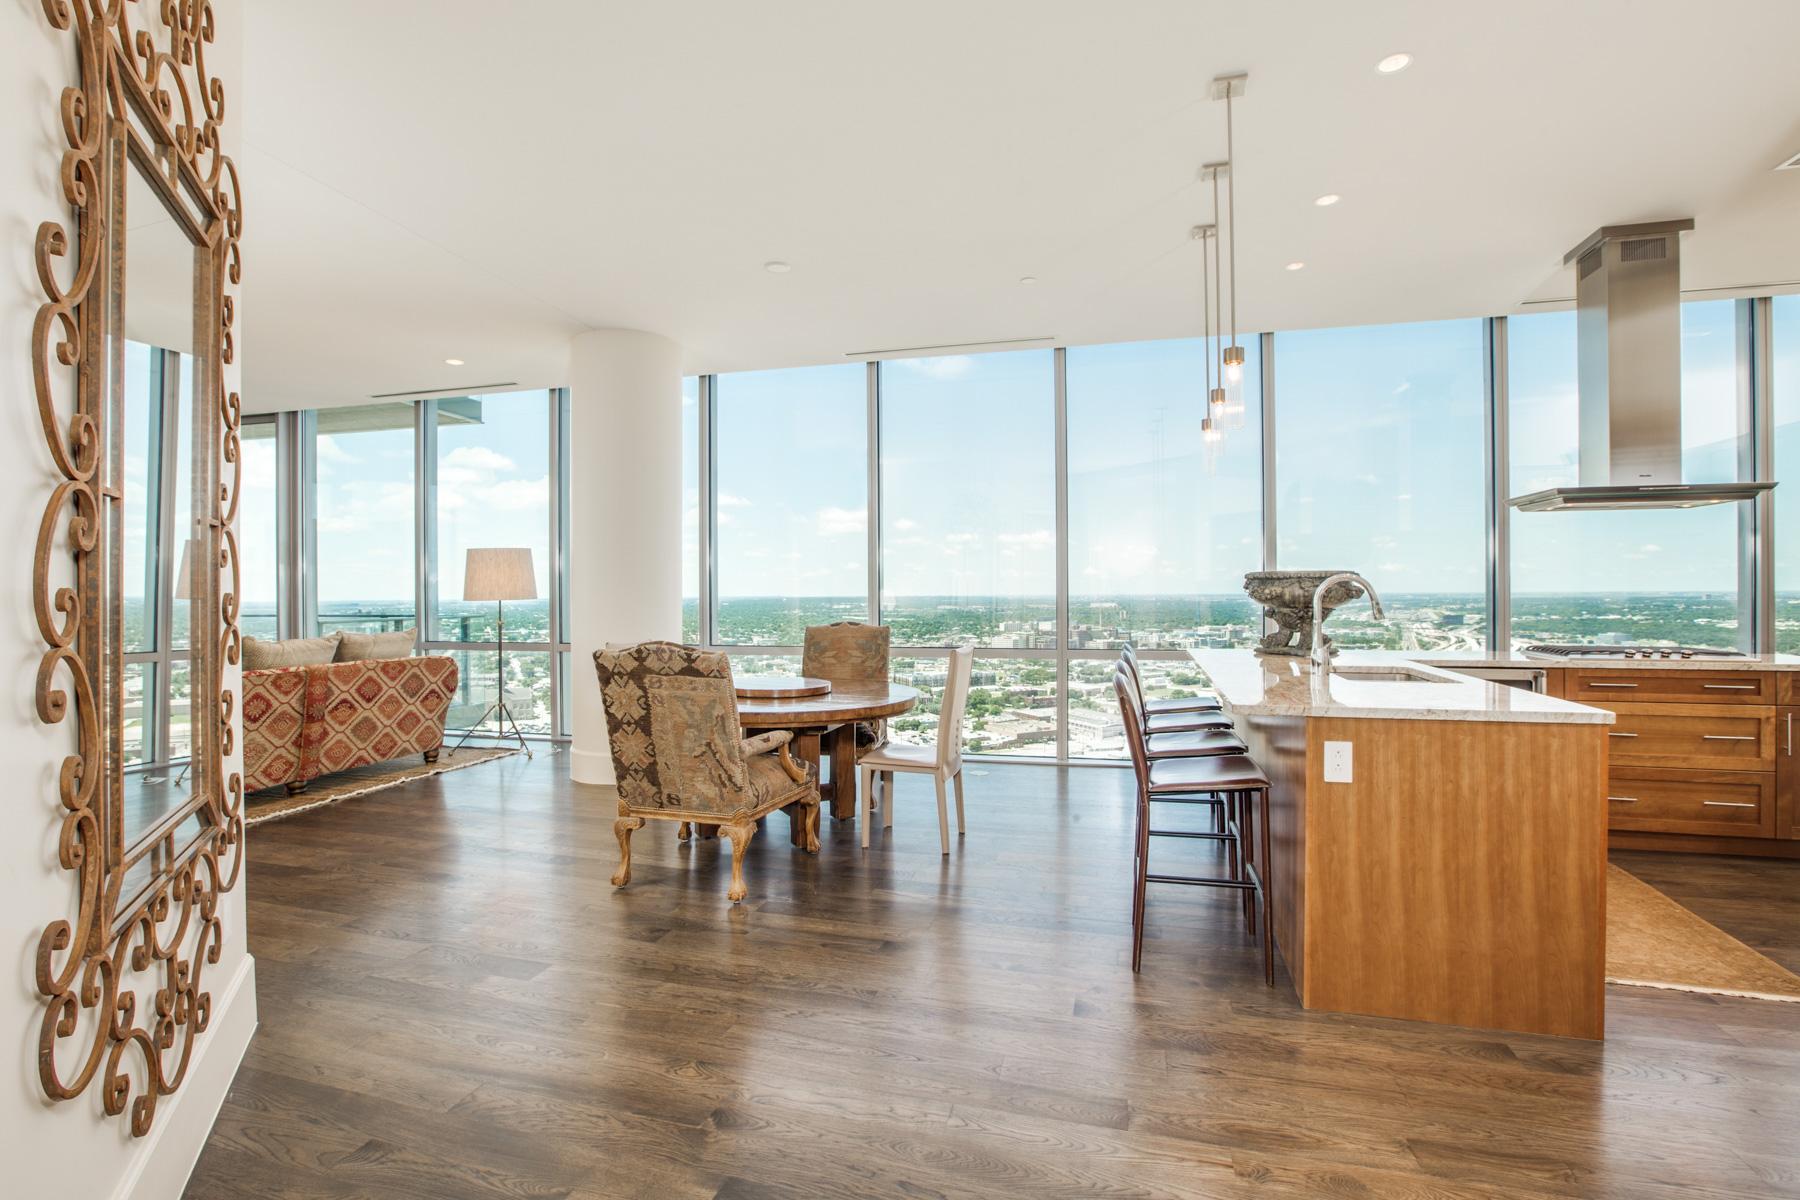 Кооперативная квартира для того Продажа на Amazing Views from this Premier Fort Worth Downtown Condo 1301 Throckmorton Street #3004 Fort Worth, Техас 76102 Соединенные Штаты